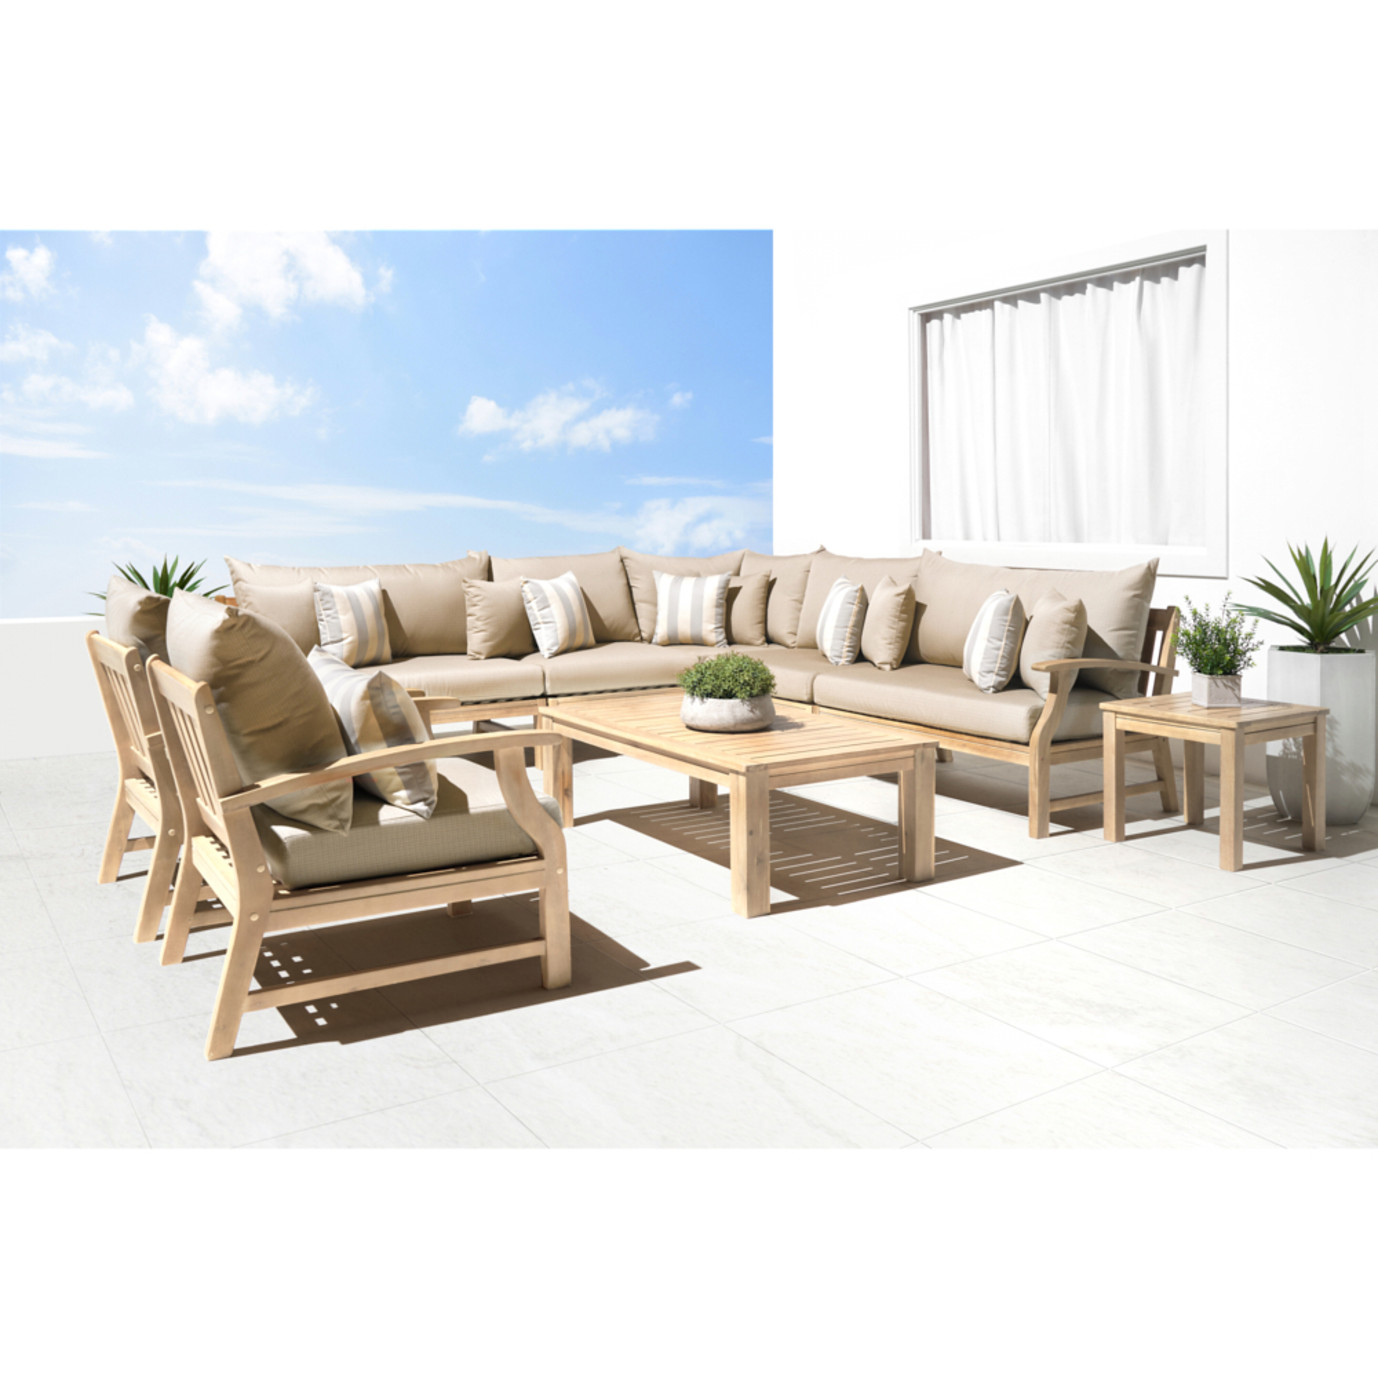 Kooper 9 Piece Seating Set - Slate Gray